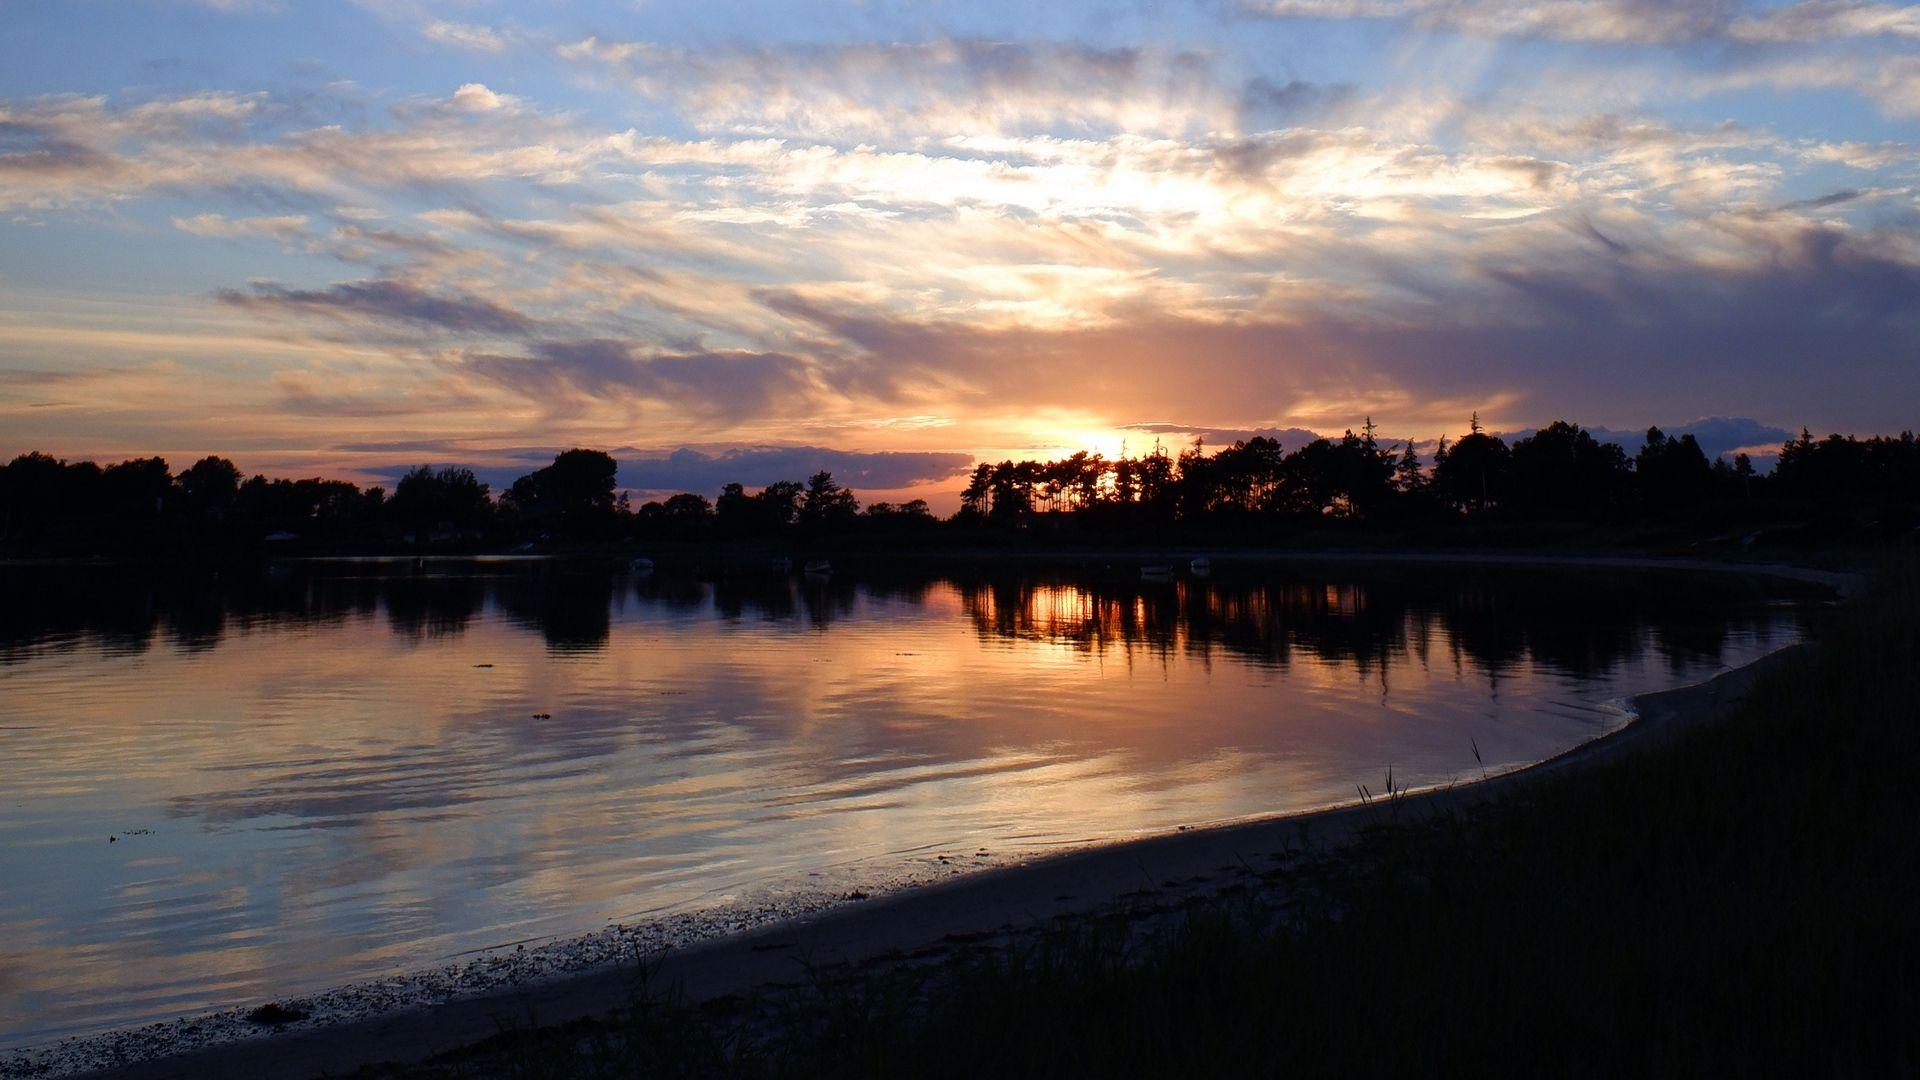 Lake Sunset Dusk Hd Wallpaper Lake Sunset Beach Wallpaper Sunset Wallpaper Wallpaper sea dusk mountains sunset lake